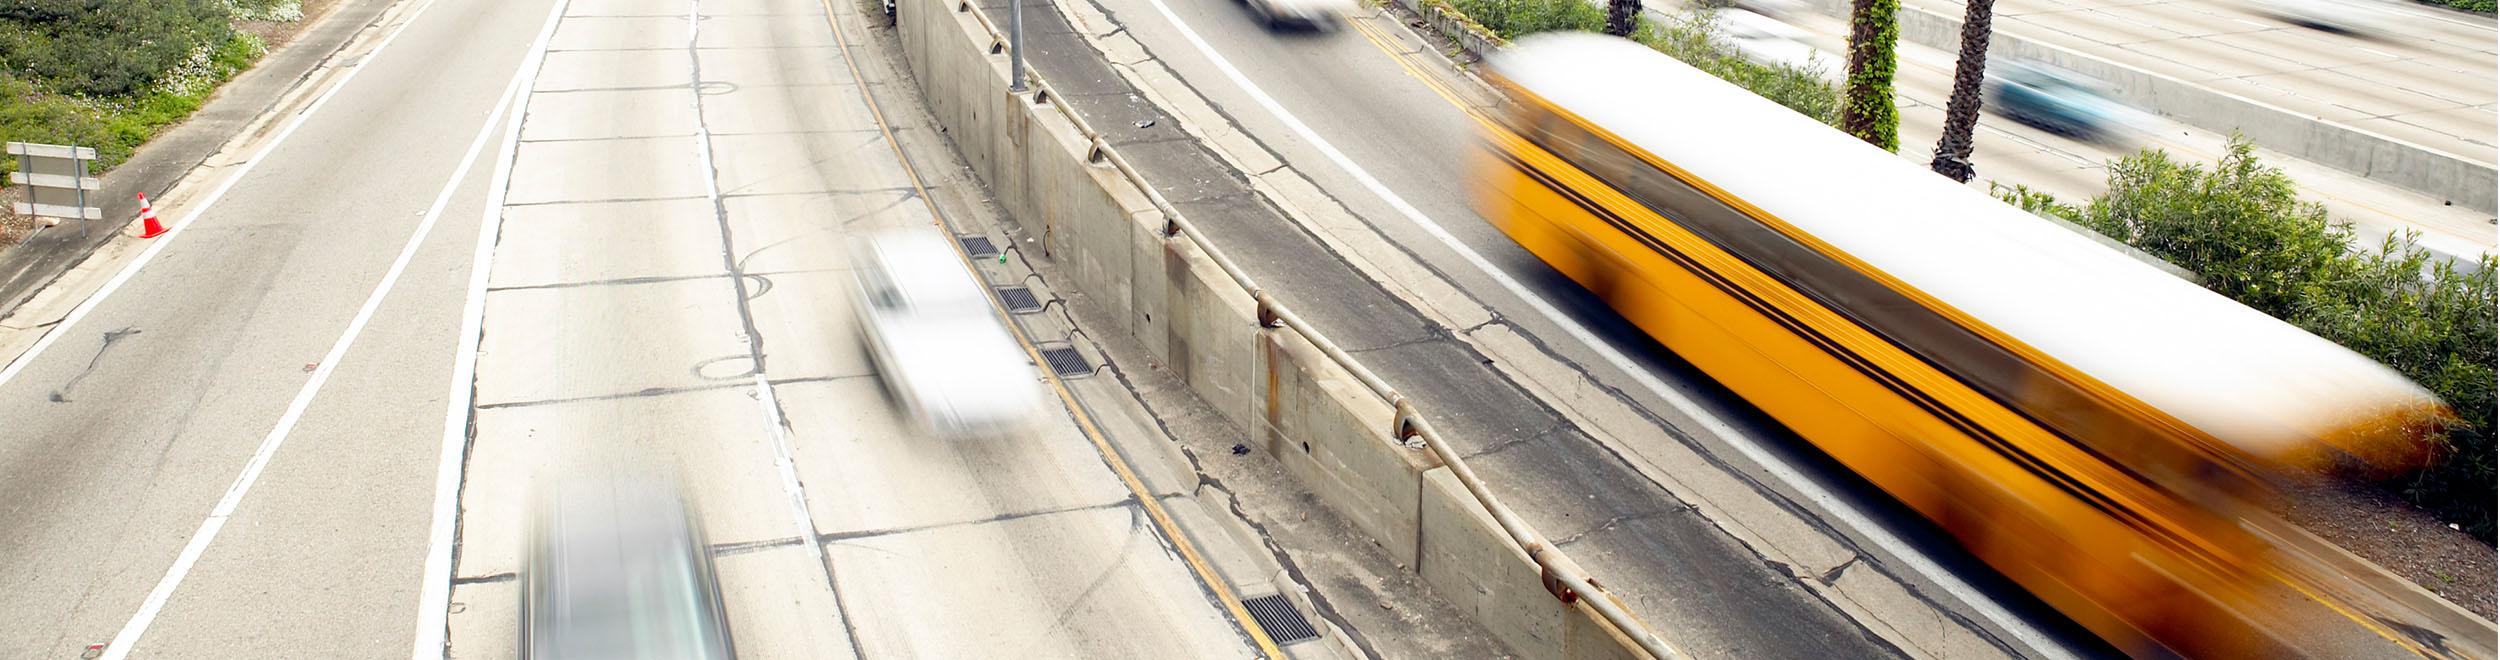 Transportation Management System Highlights